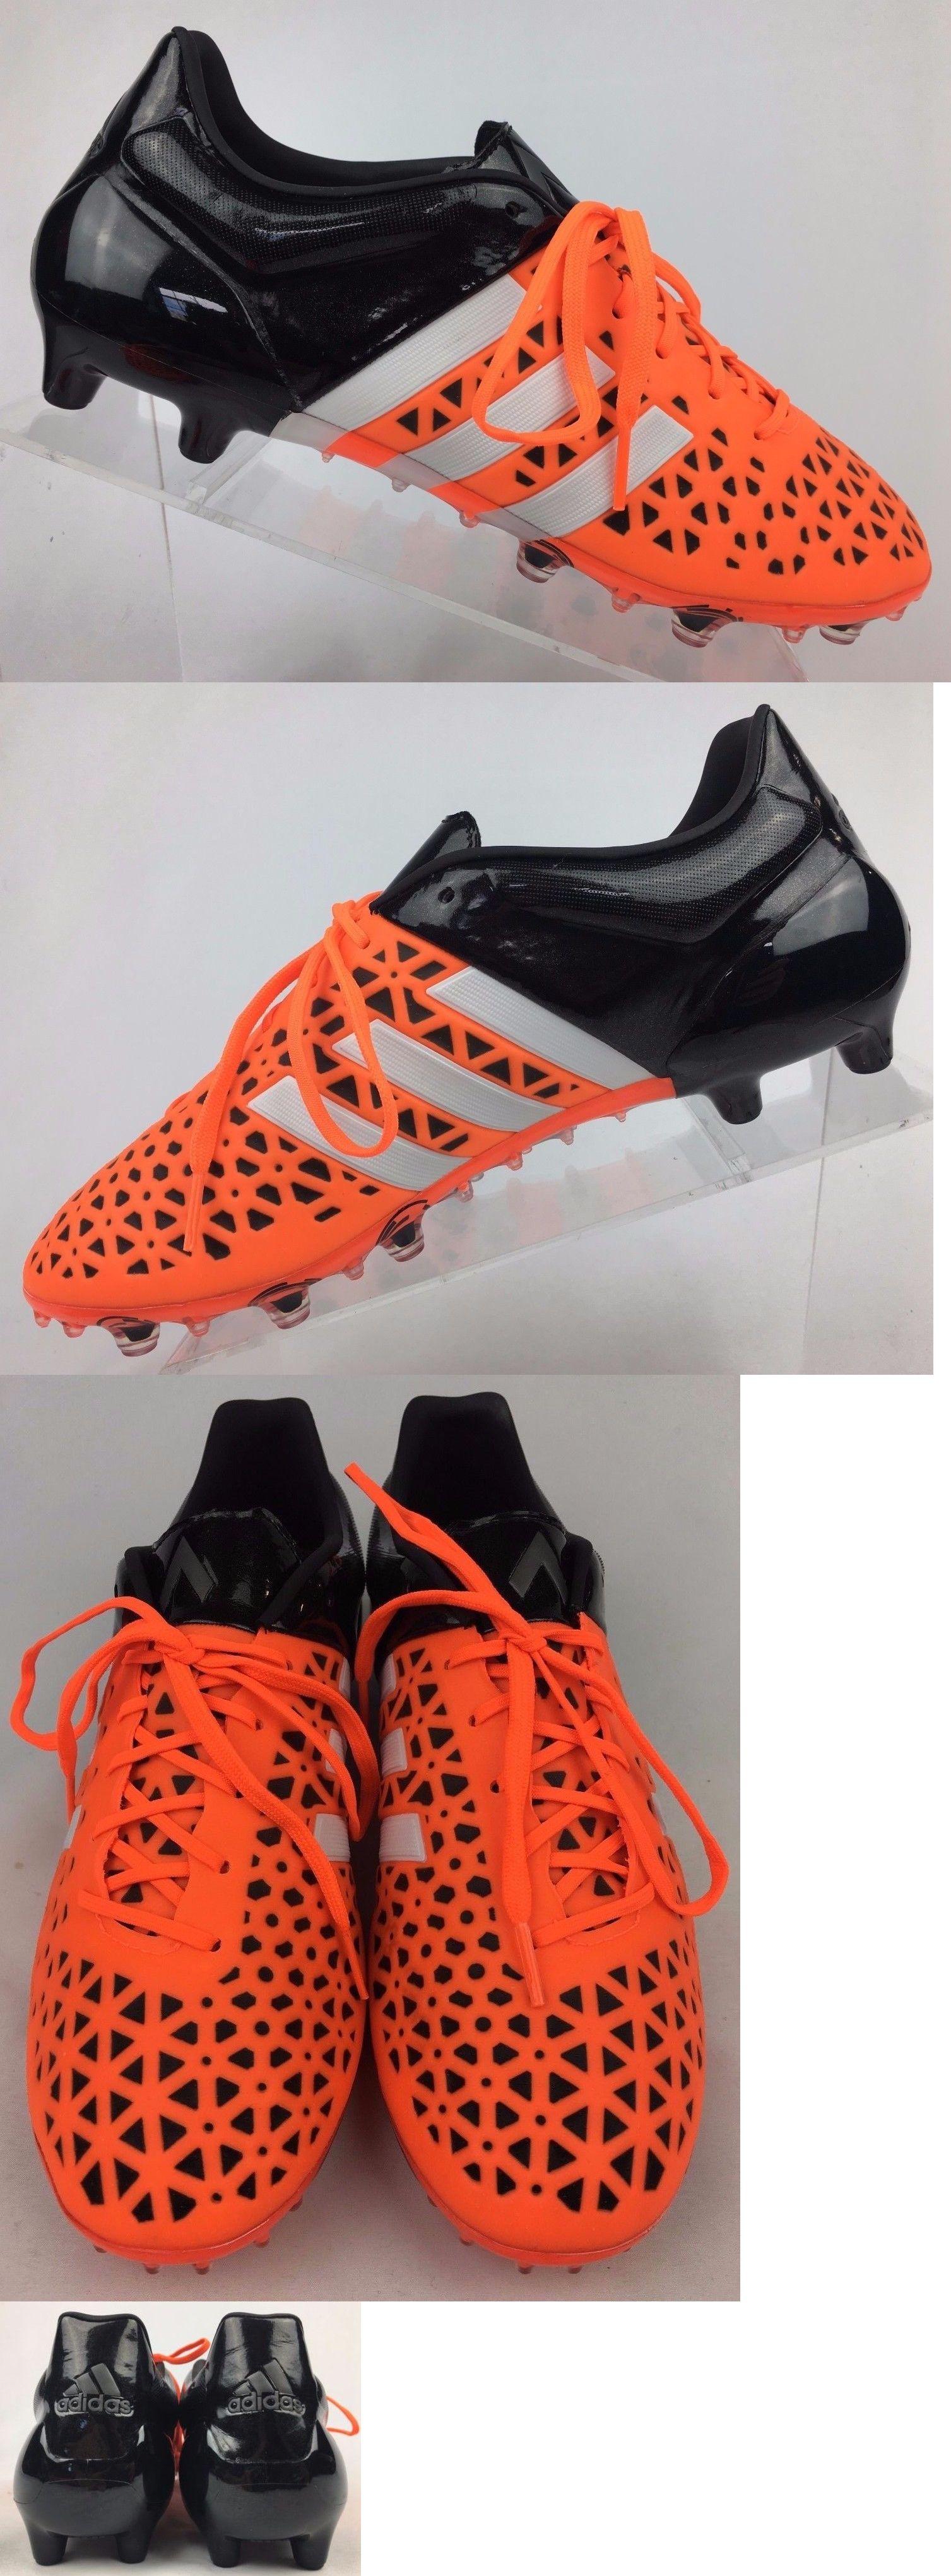 Men 109133  Adidas Ace 15.1 Fg Ag Soccer Cleats Men S Size 9.5 Solar Orange 621df4bbf